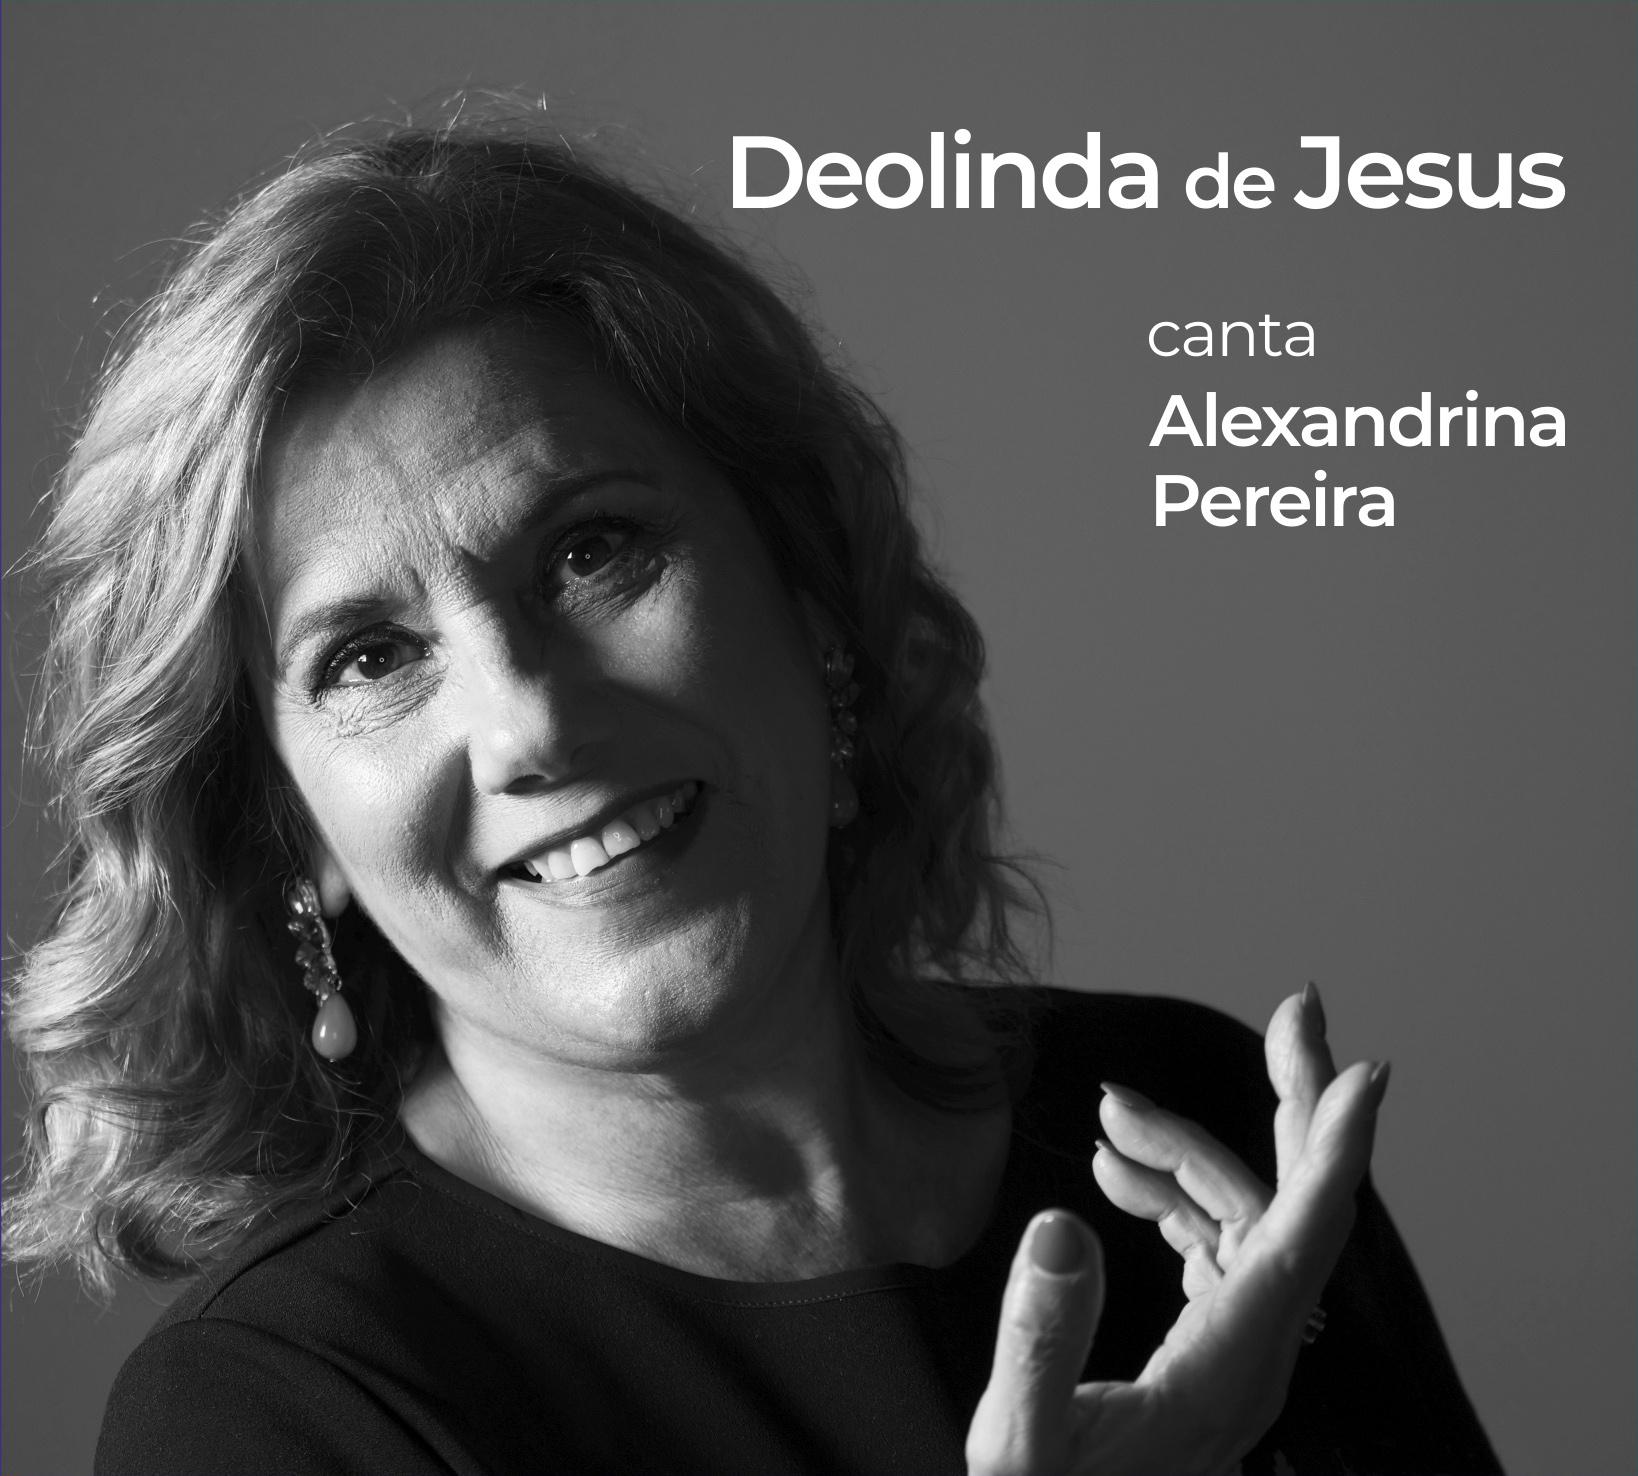 FADO   Deolinda de Jesus canta Alexandrina Pereira